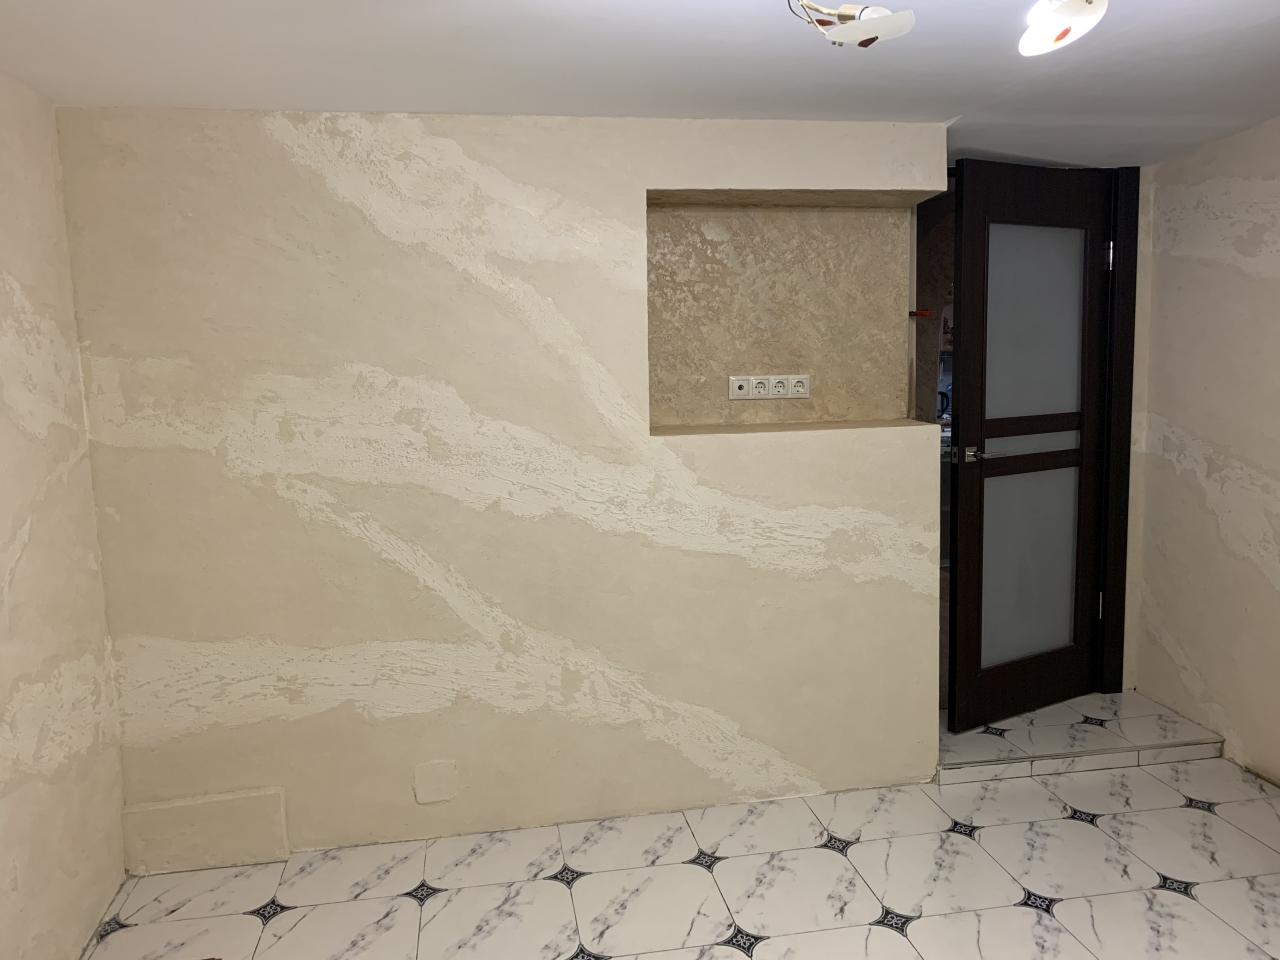 Комната отдыха, Новороссийск - Rivedil DecorFondo+Travertino(fino)+HydroFinish Opaco R